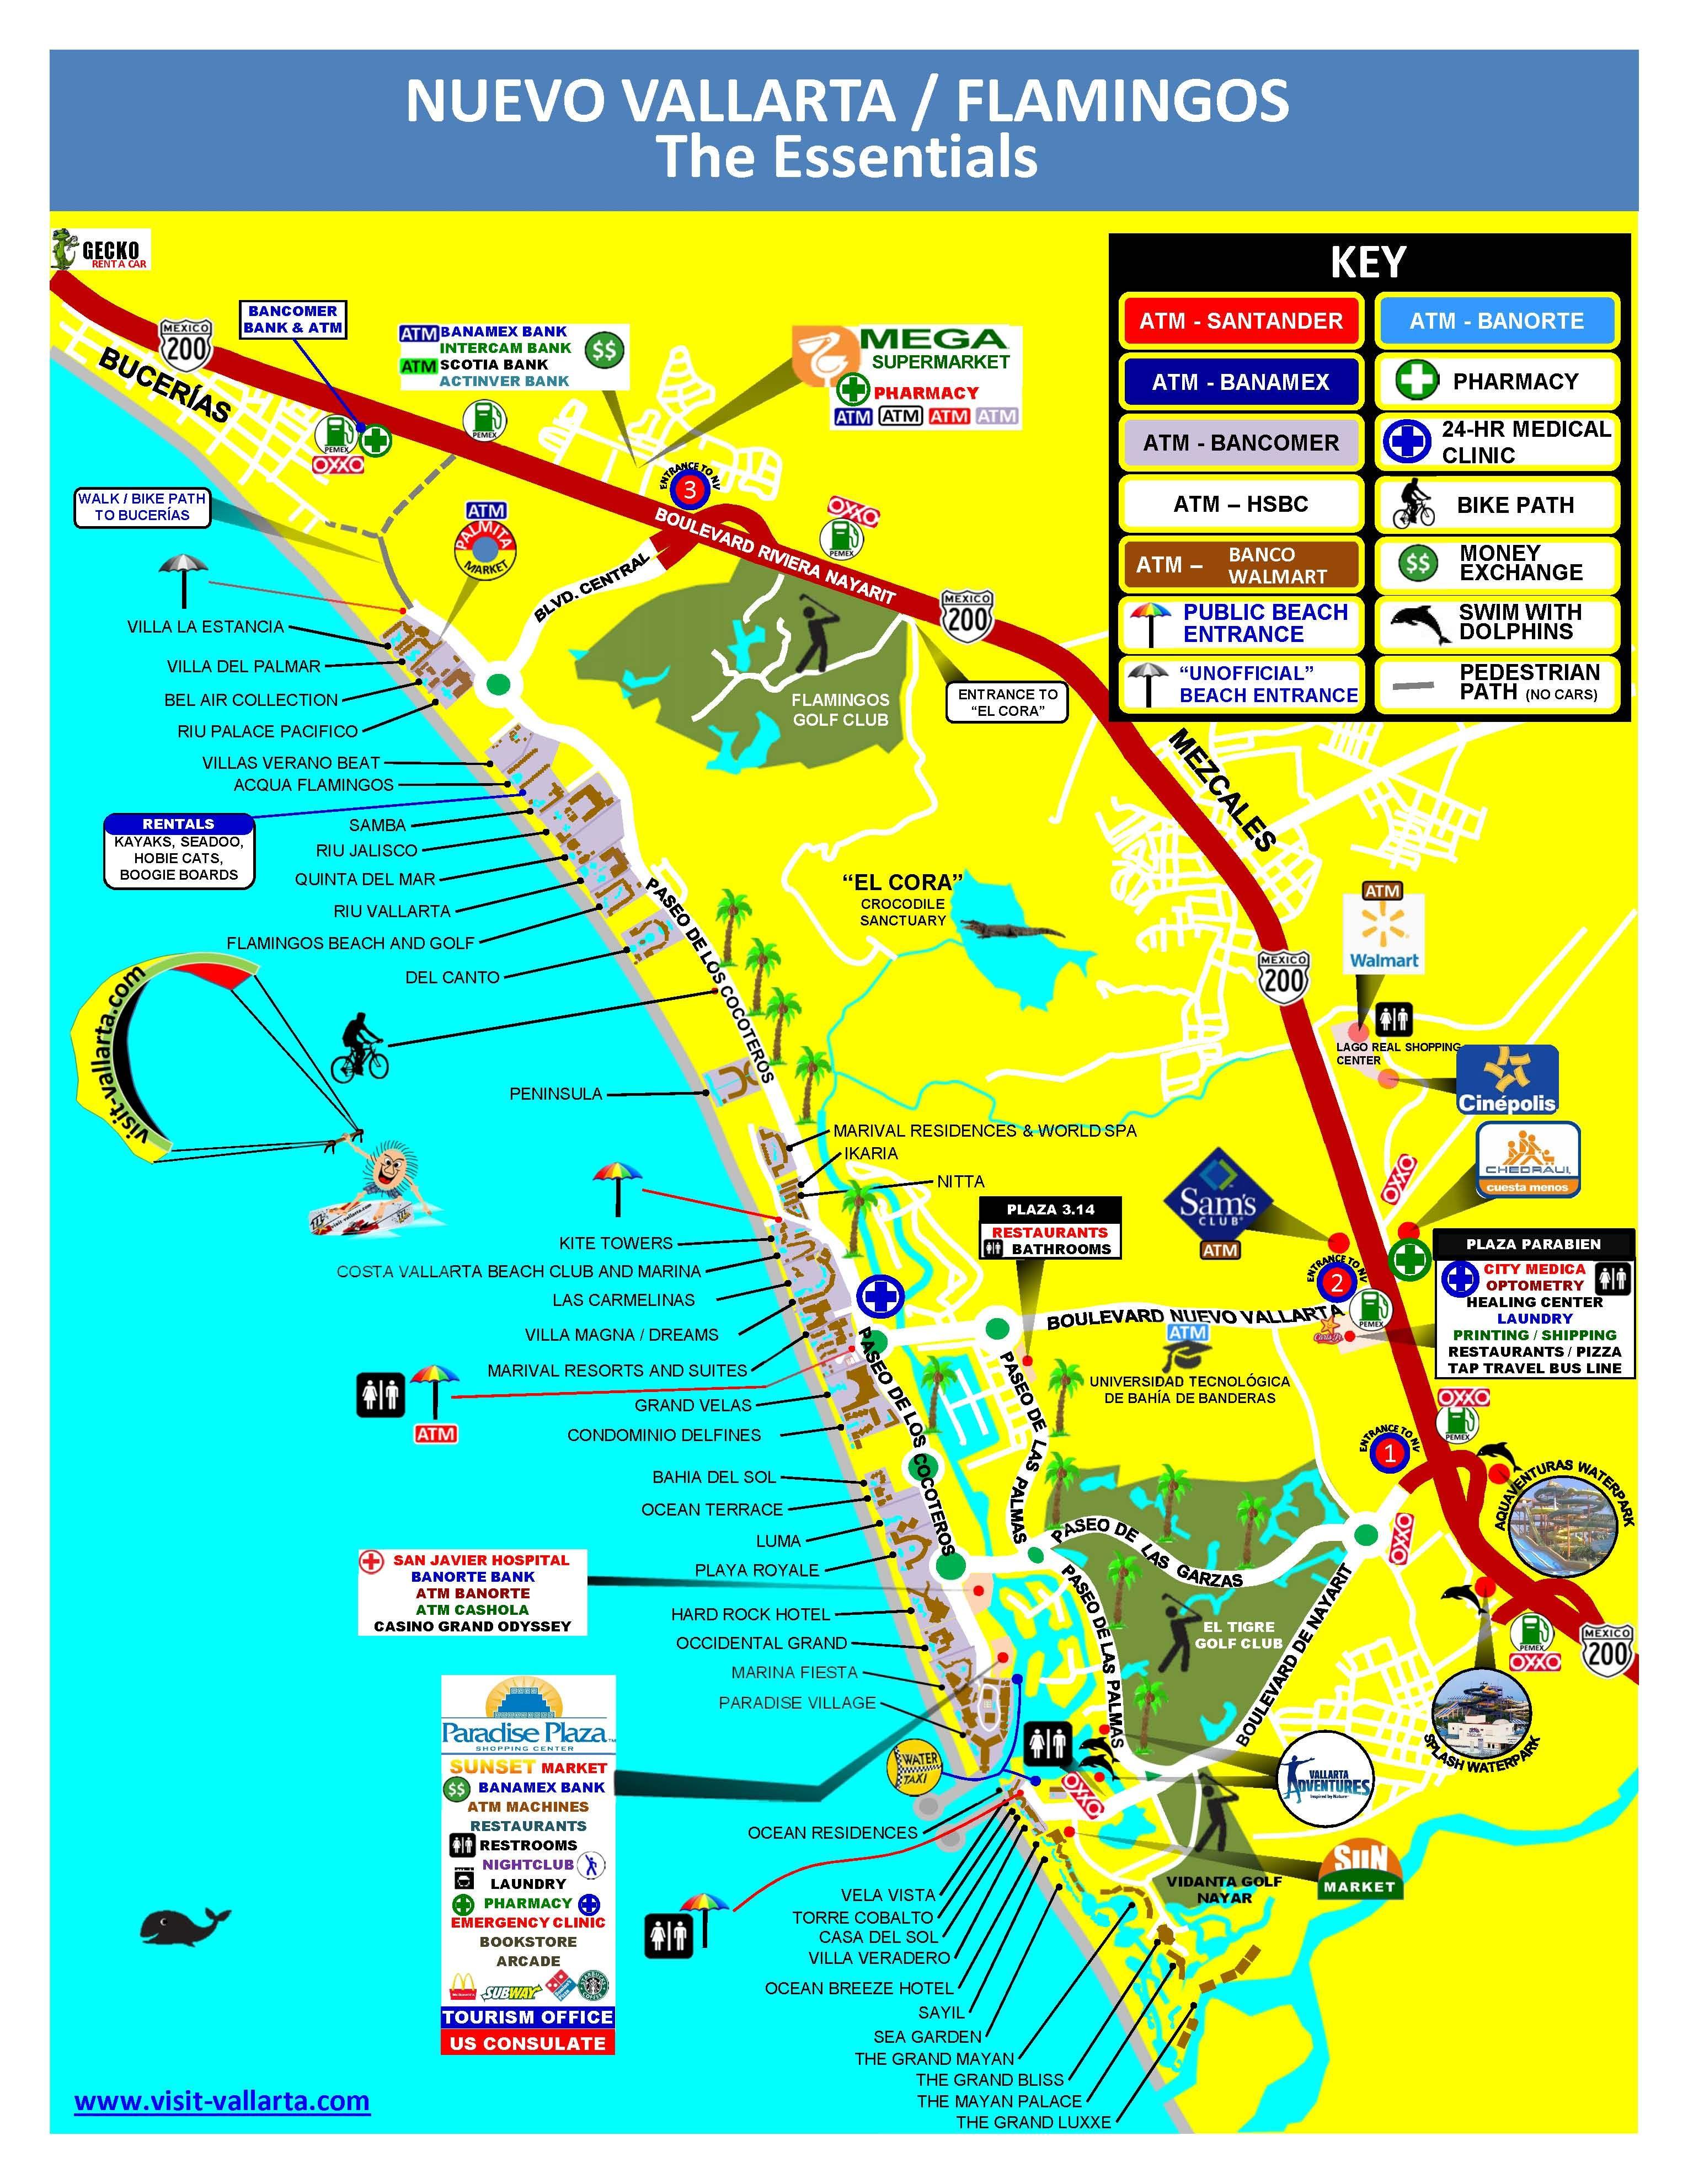 Nuevo vallarta is just 15 minutes north of puerto vallarta mexico nuevo vallarta is